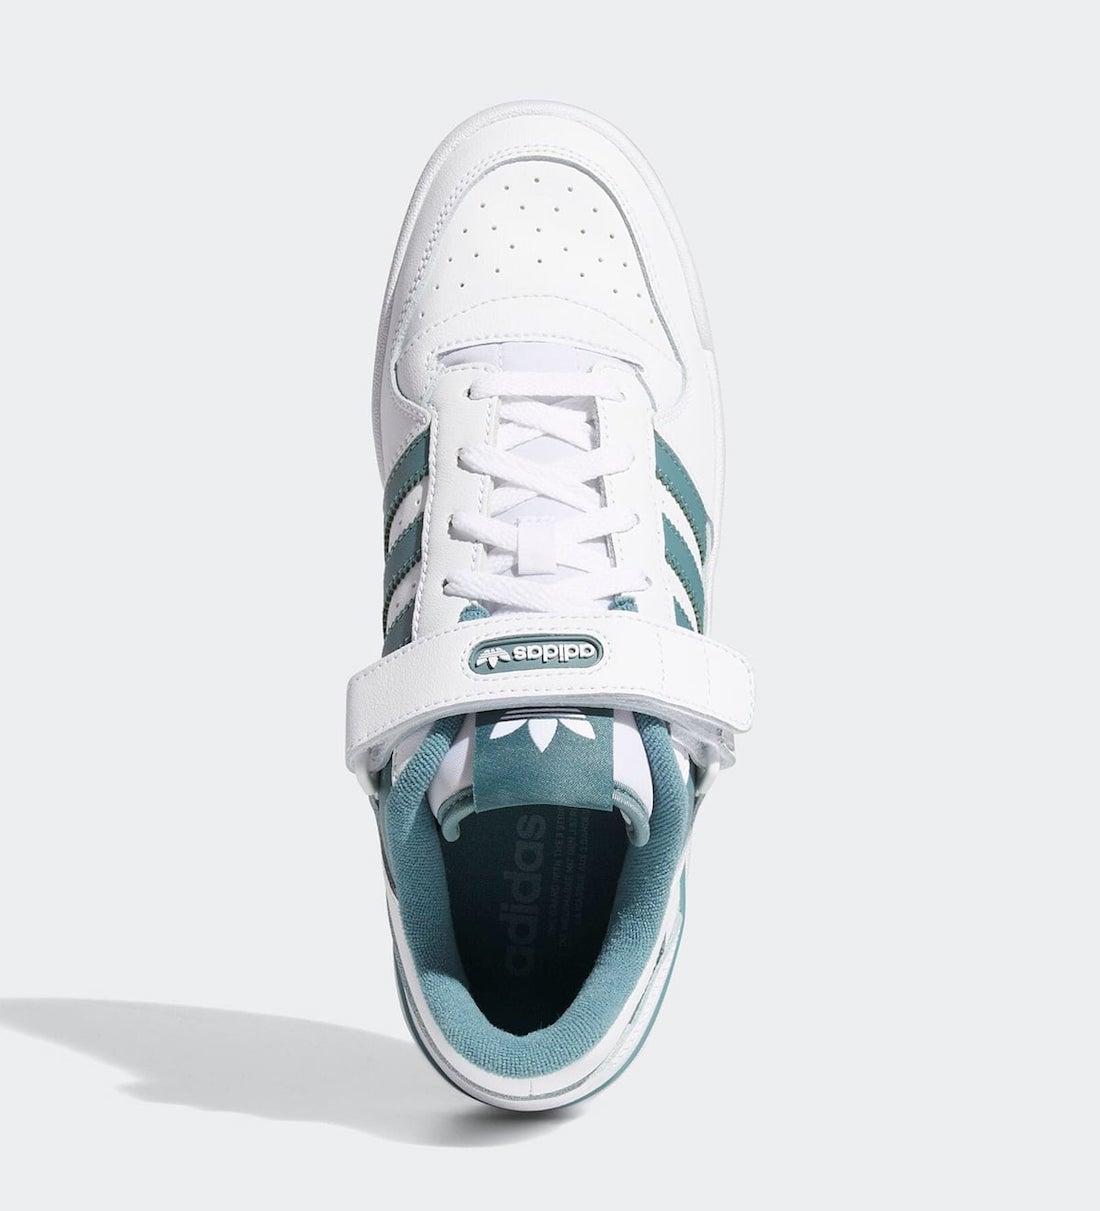 adidas Forum Low Hazy Emerald adidas Forum Low Hazy Emerald FY7758 Release Date Info